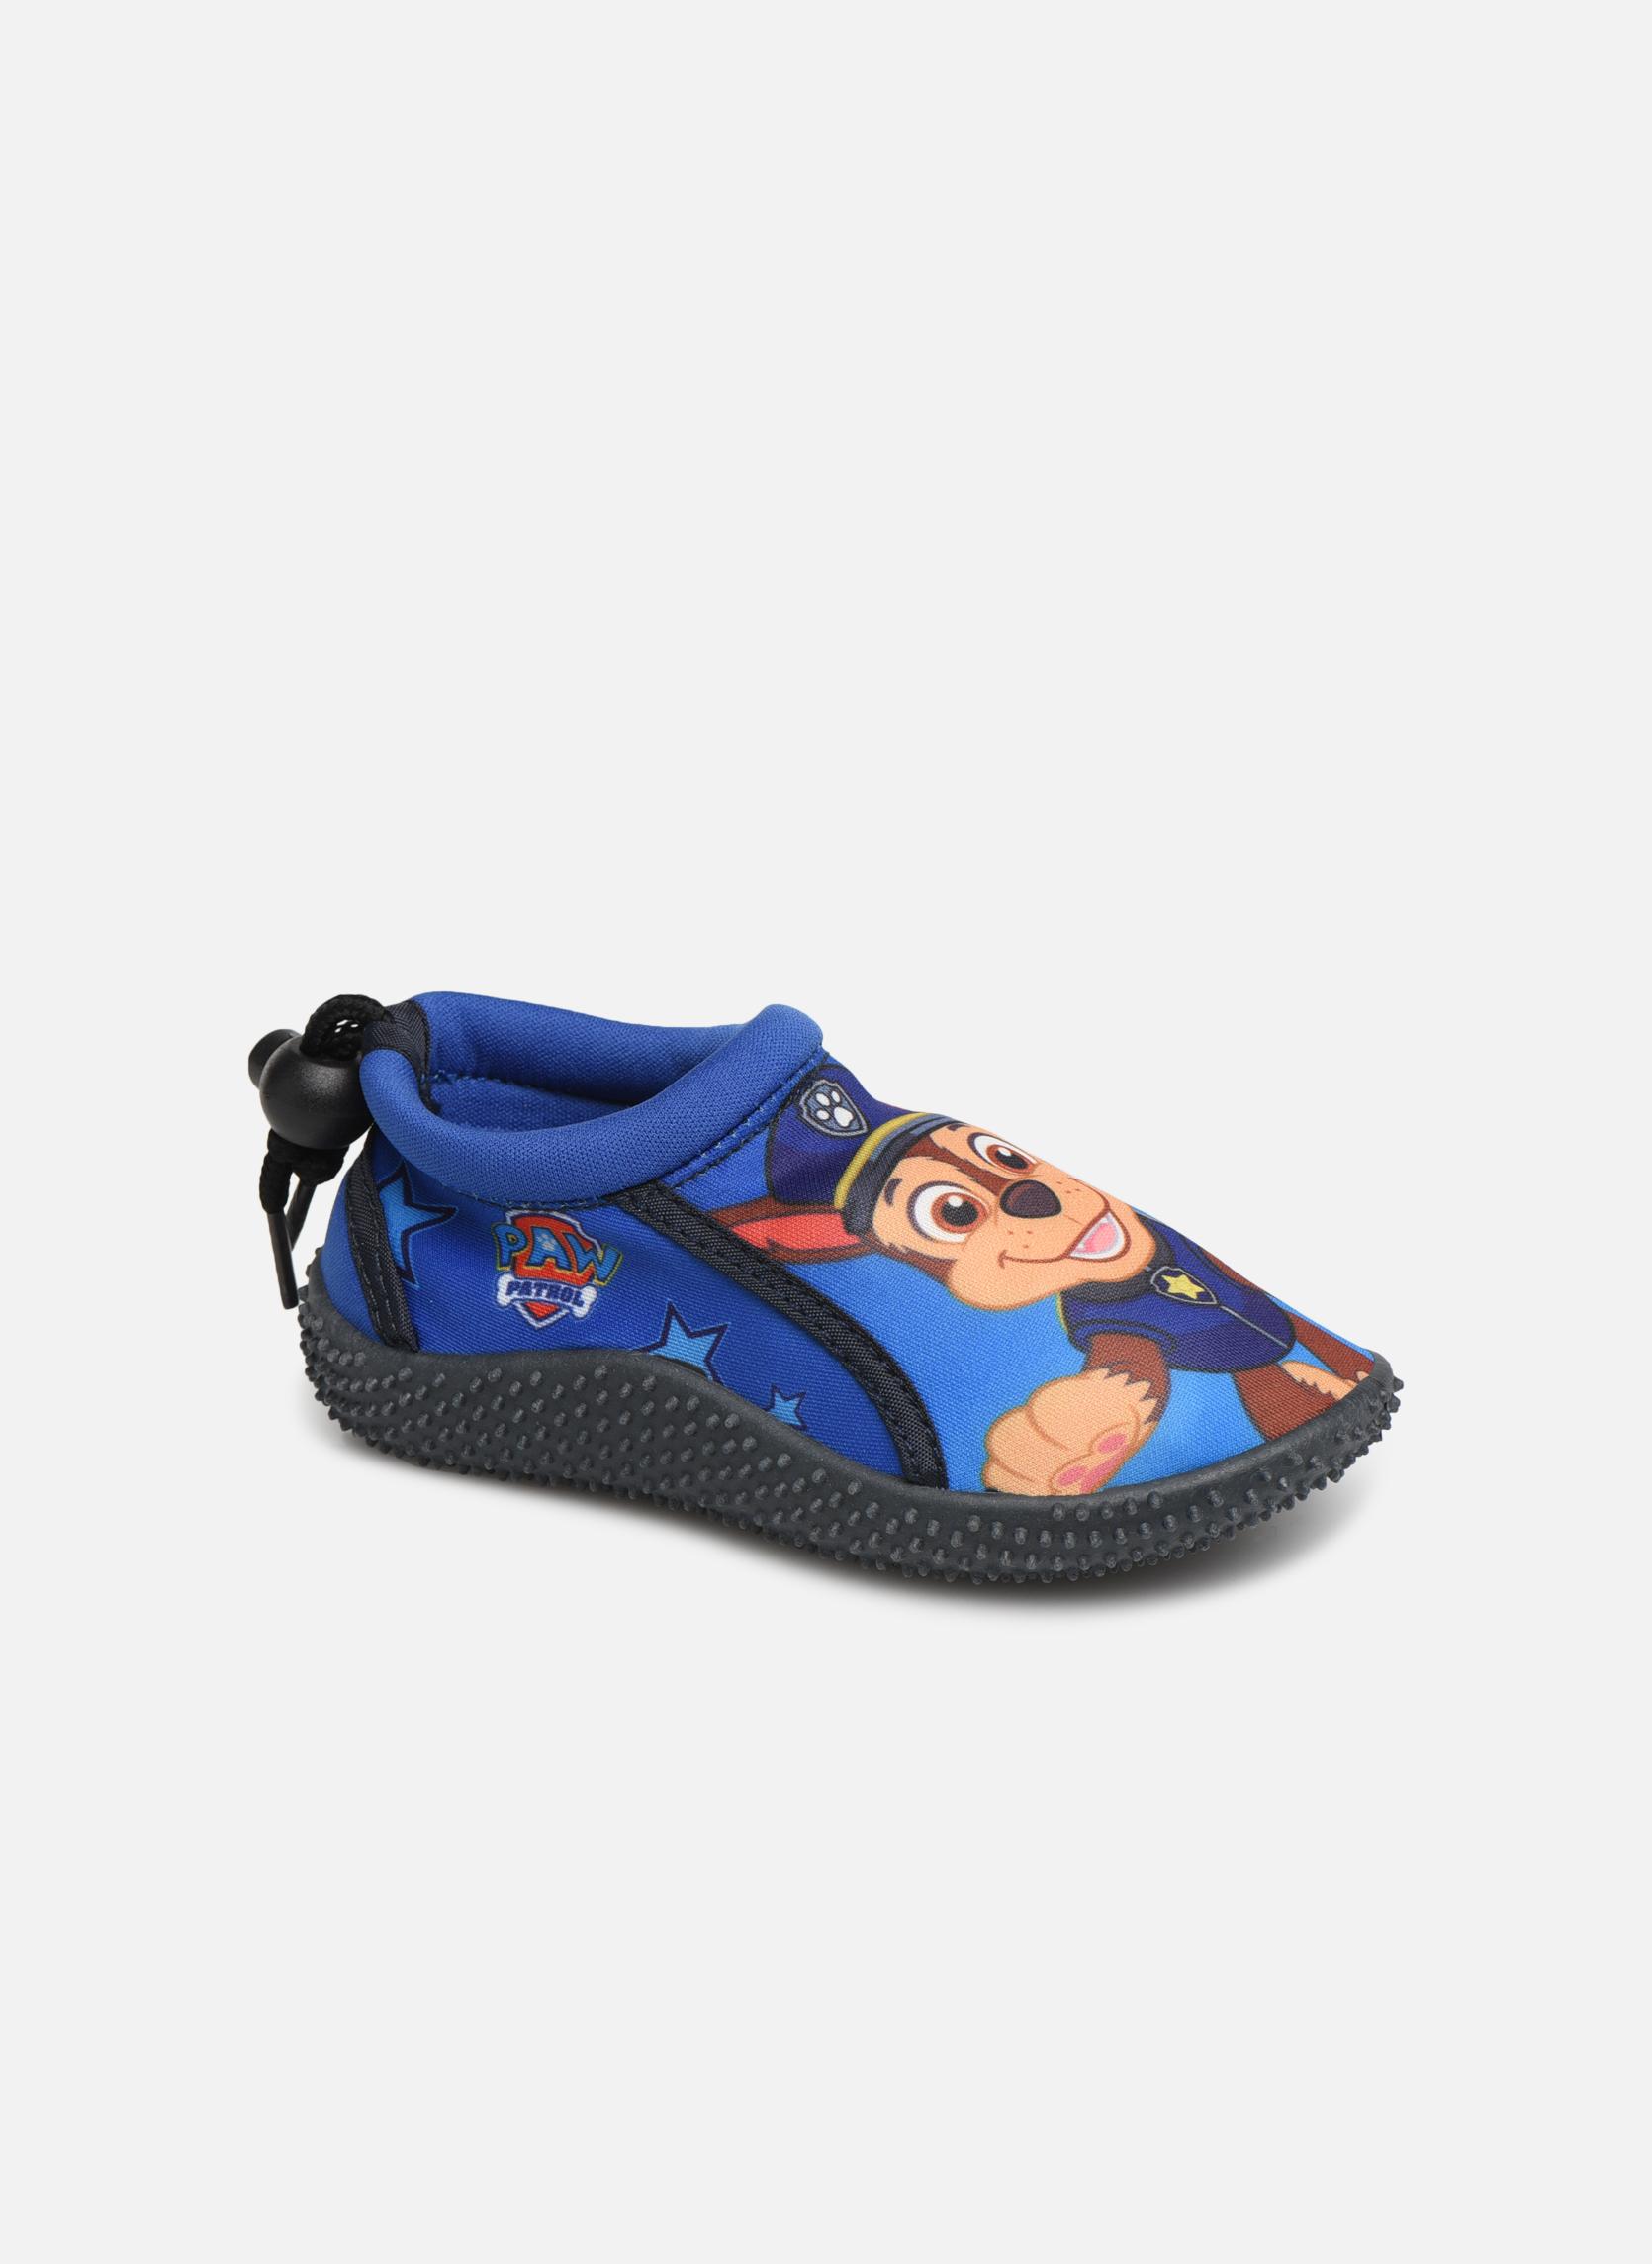 Pantoffels Pat Patrouille Blauw